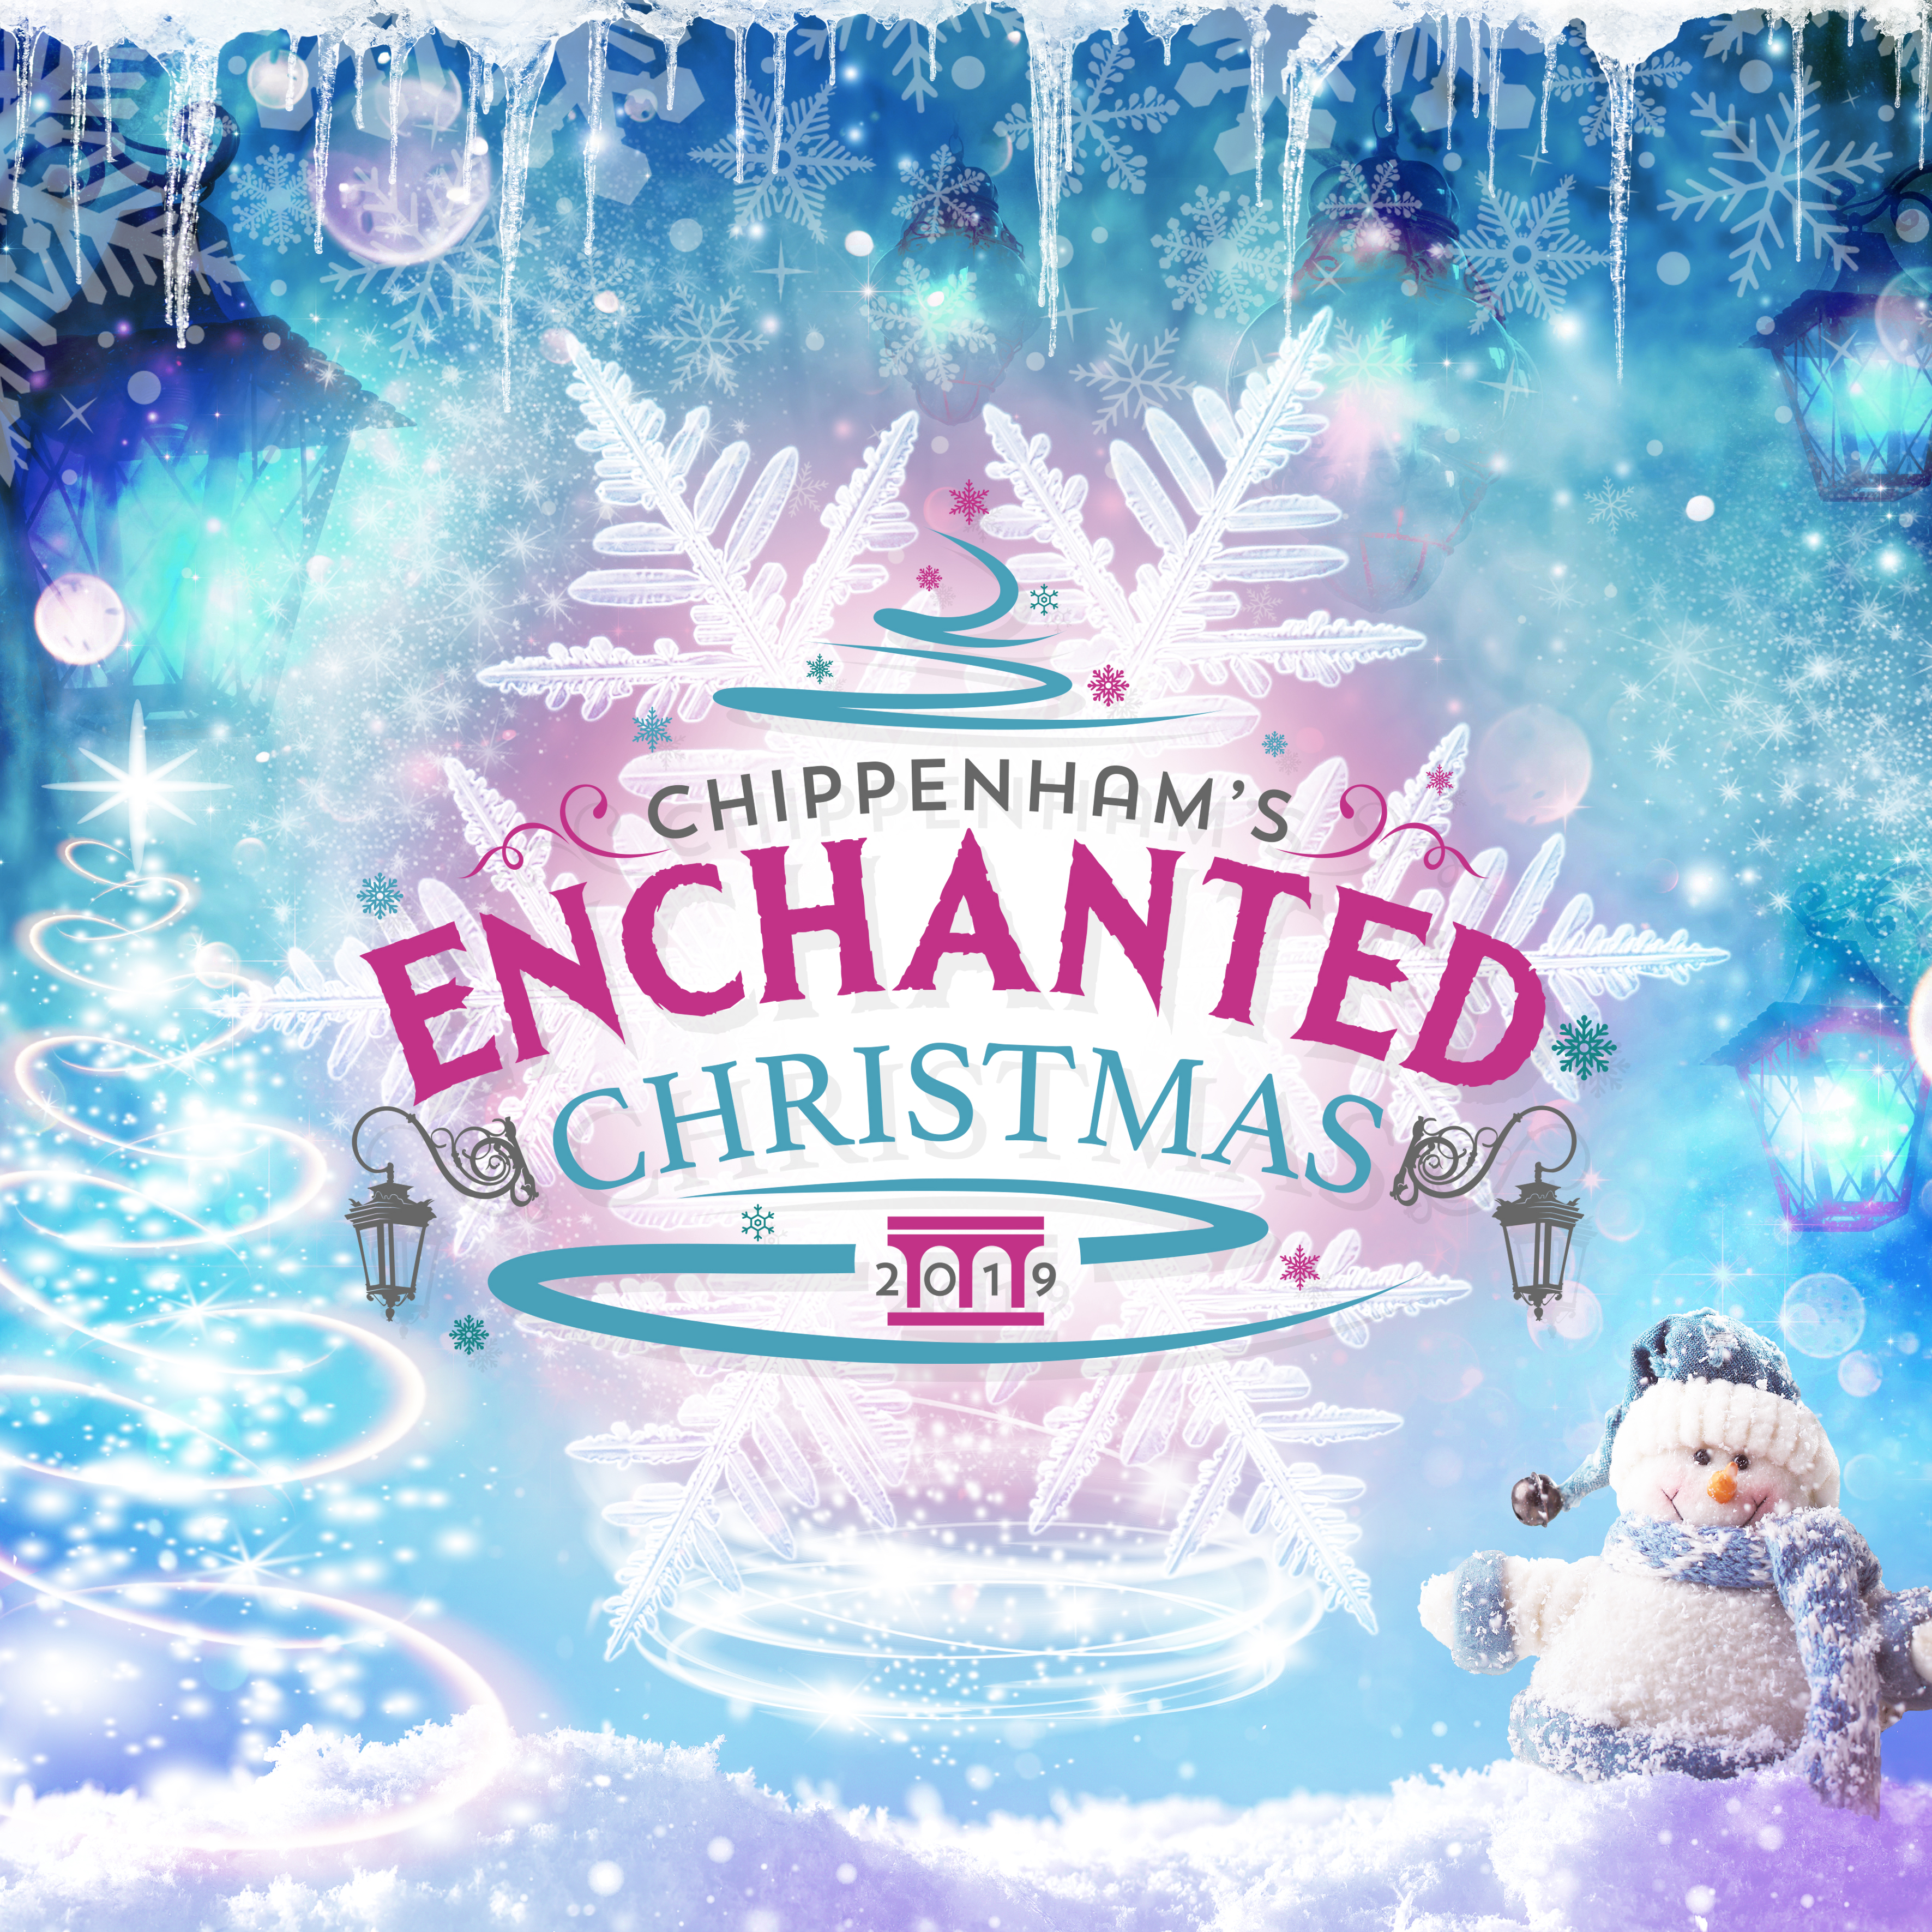 Enchanted Christmas.Chippenham S Enchanted Christmas Light Switch On